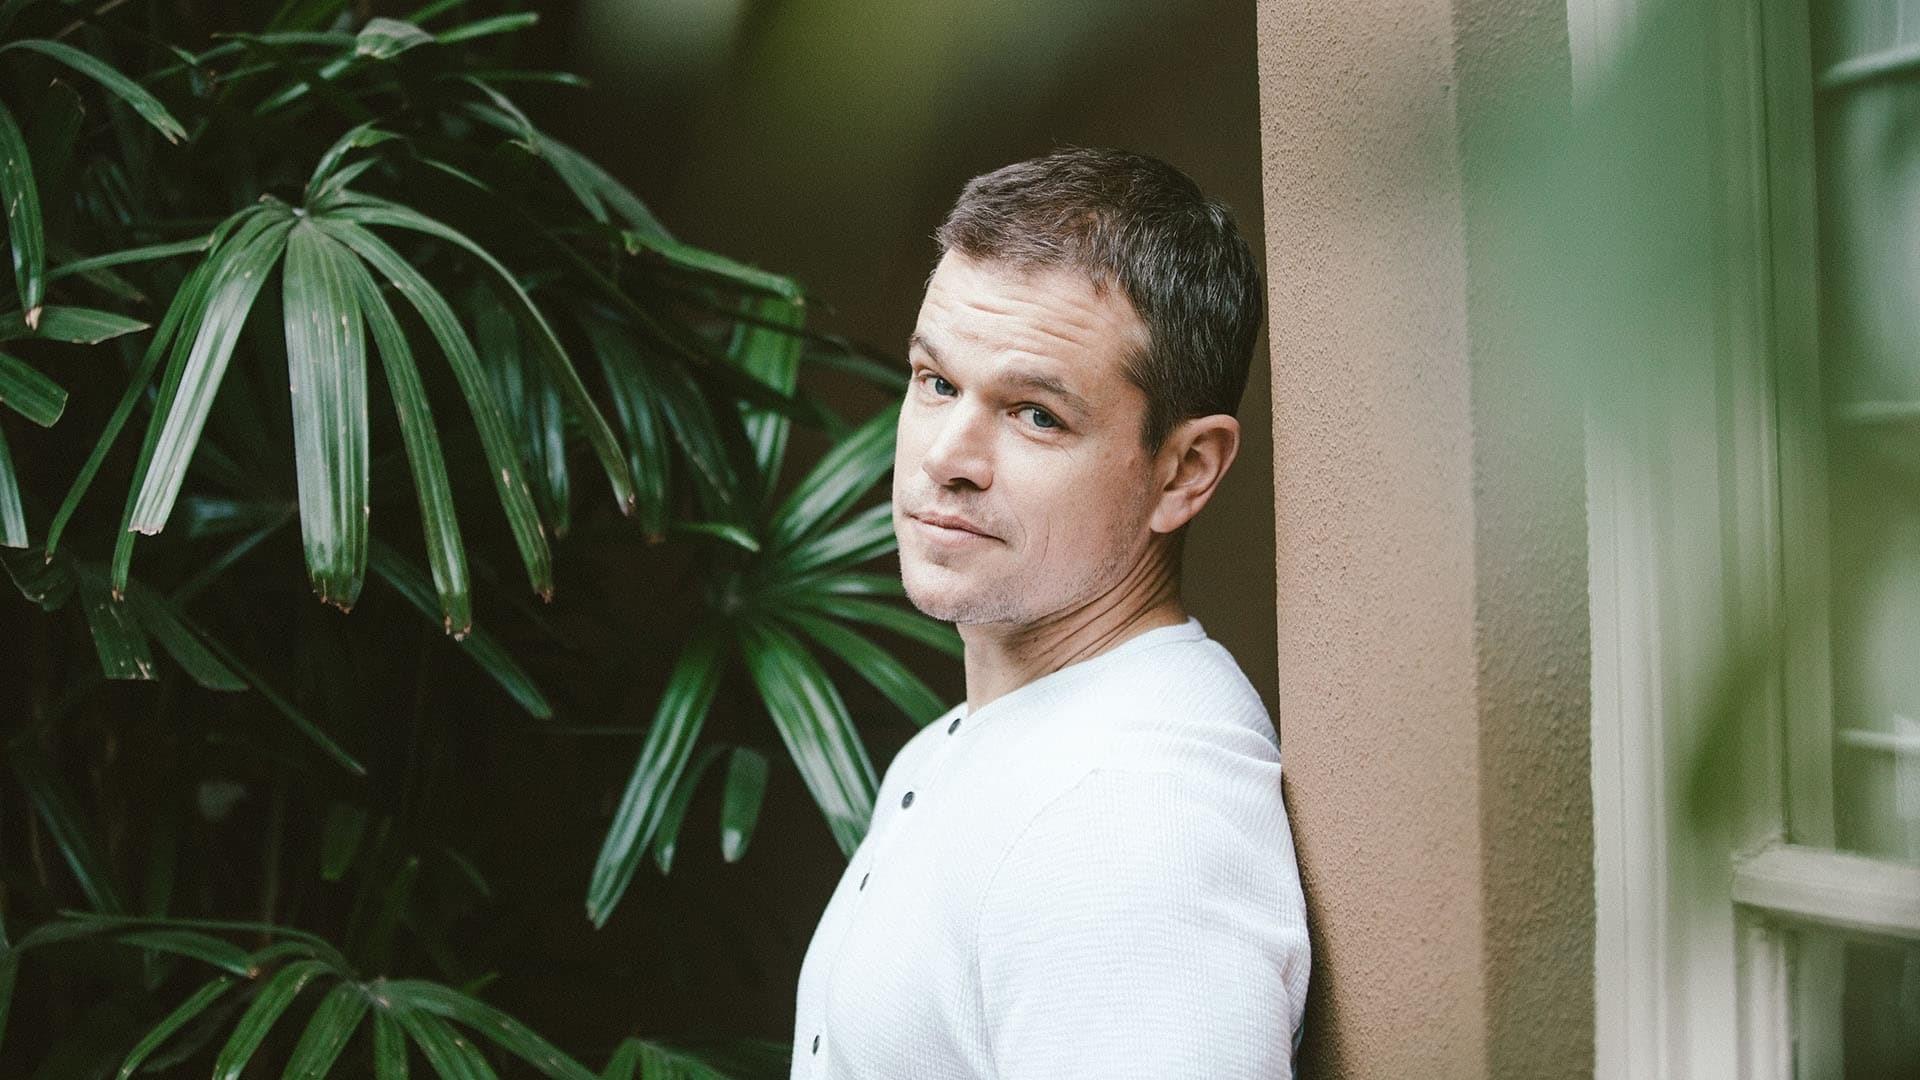 Matt Damon Wallpapers 2